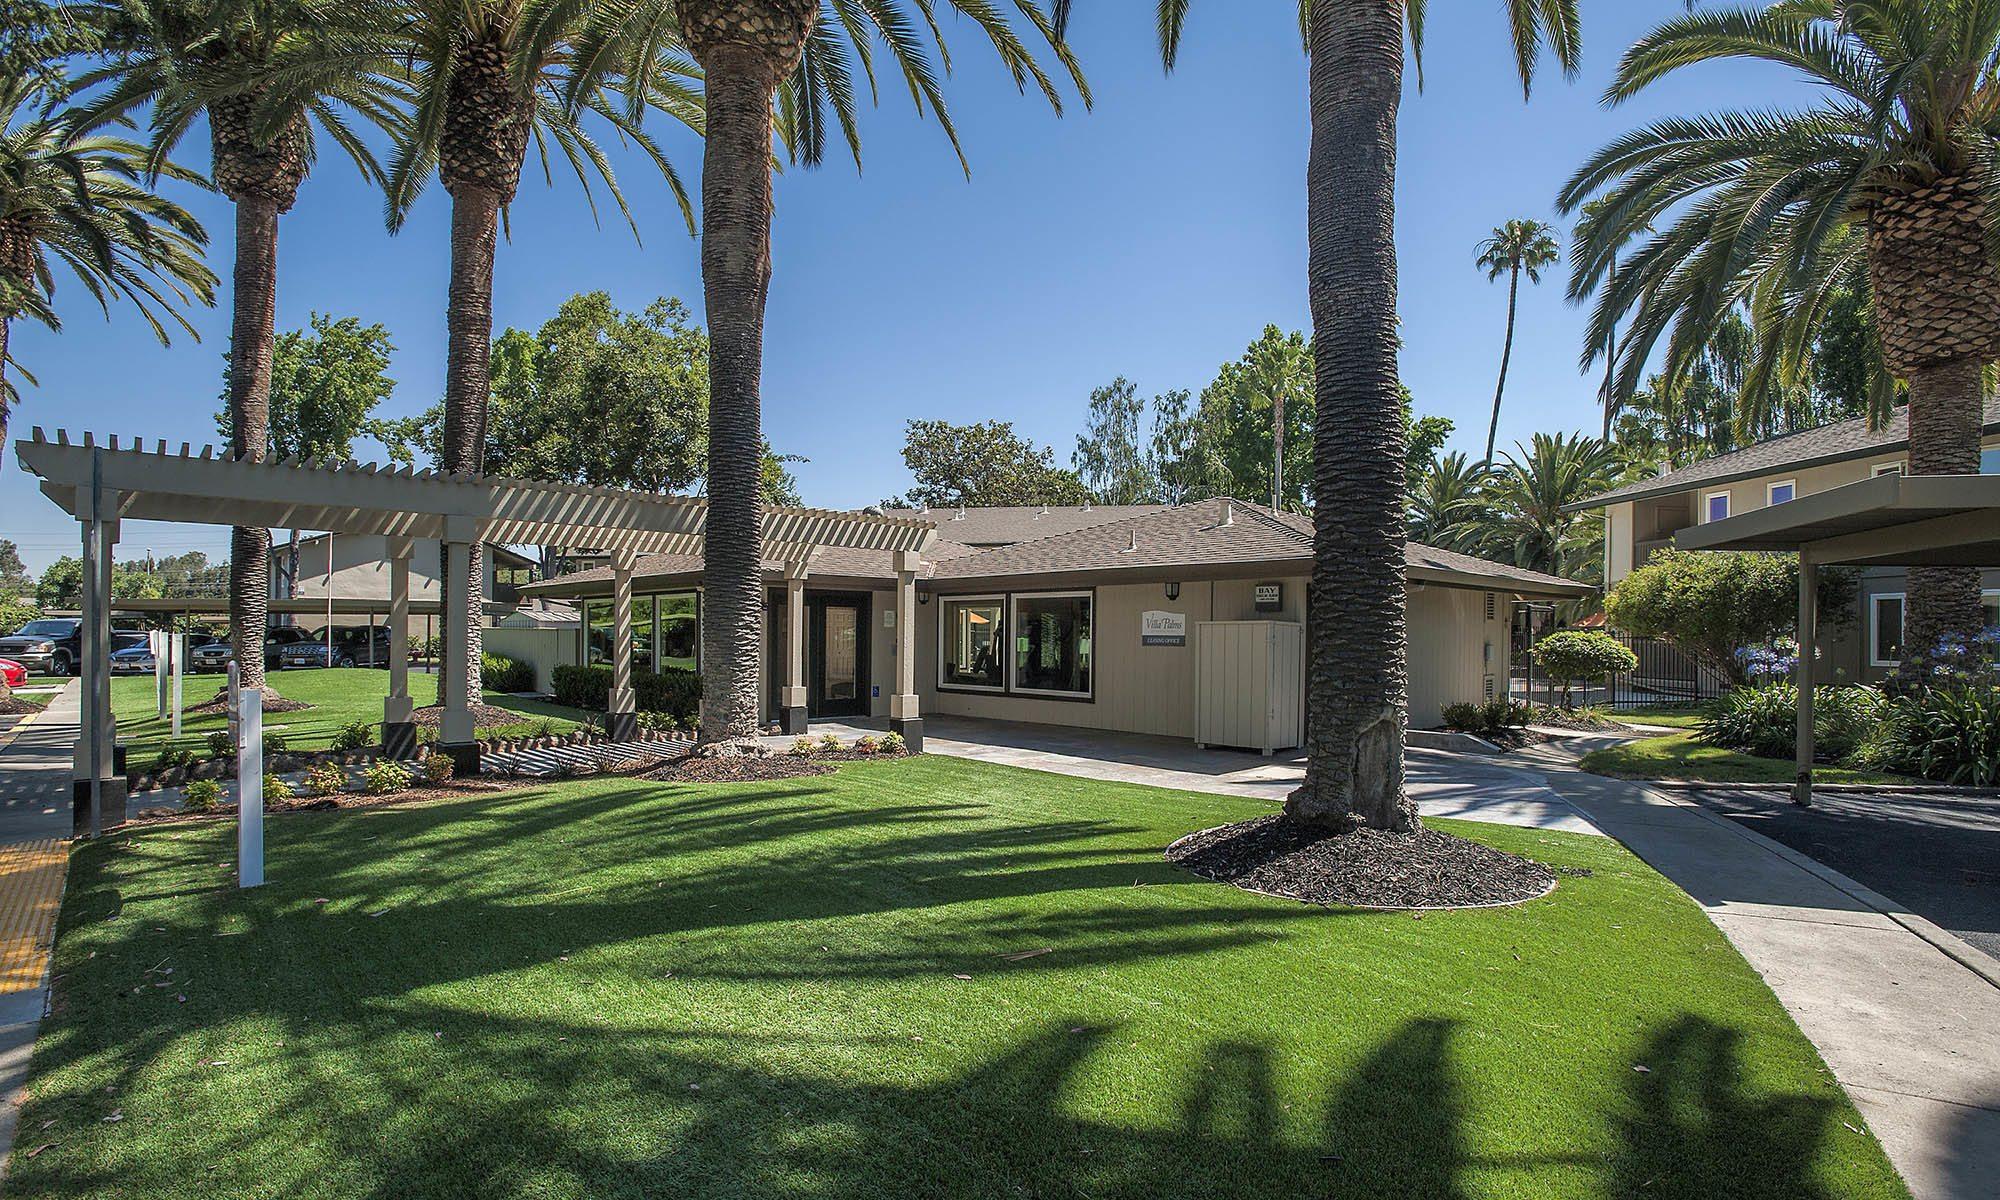 Apartments in Livermore, CA